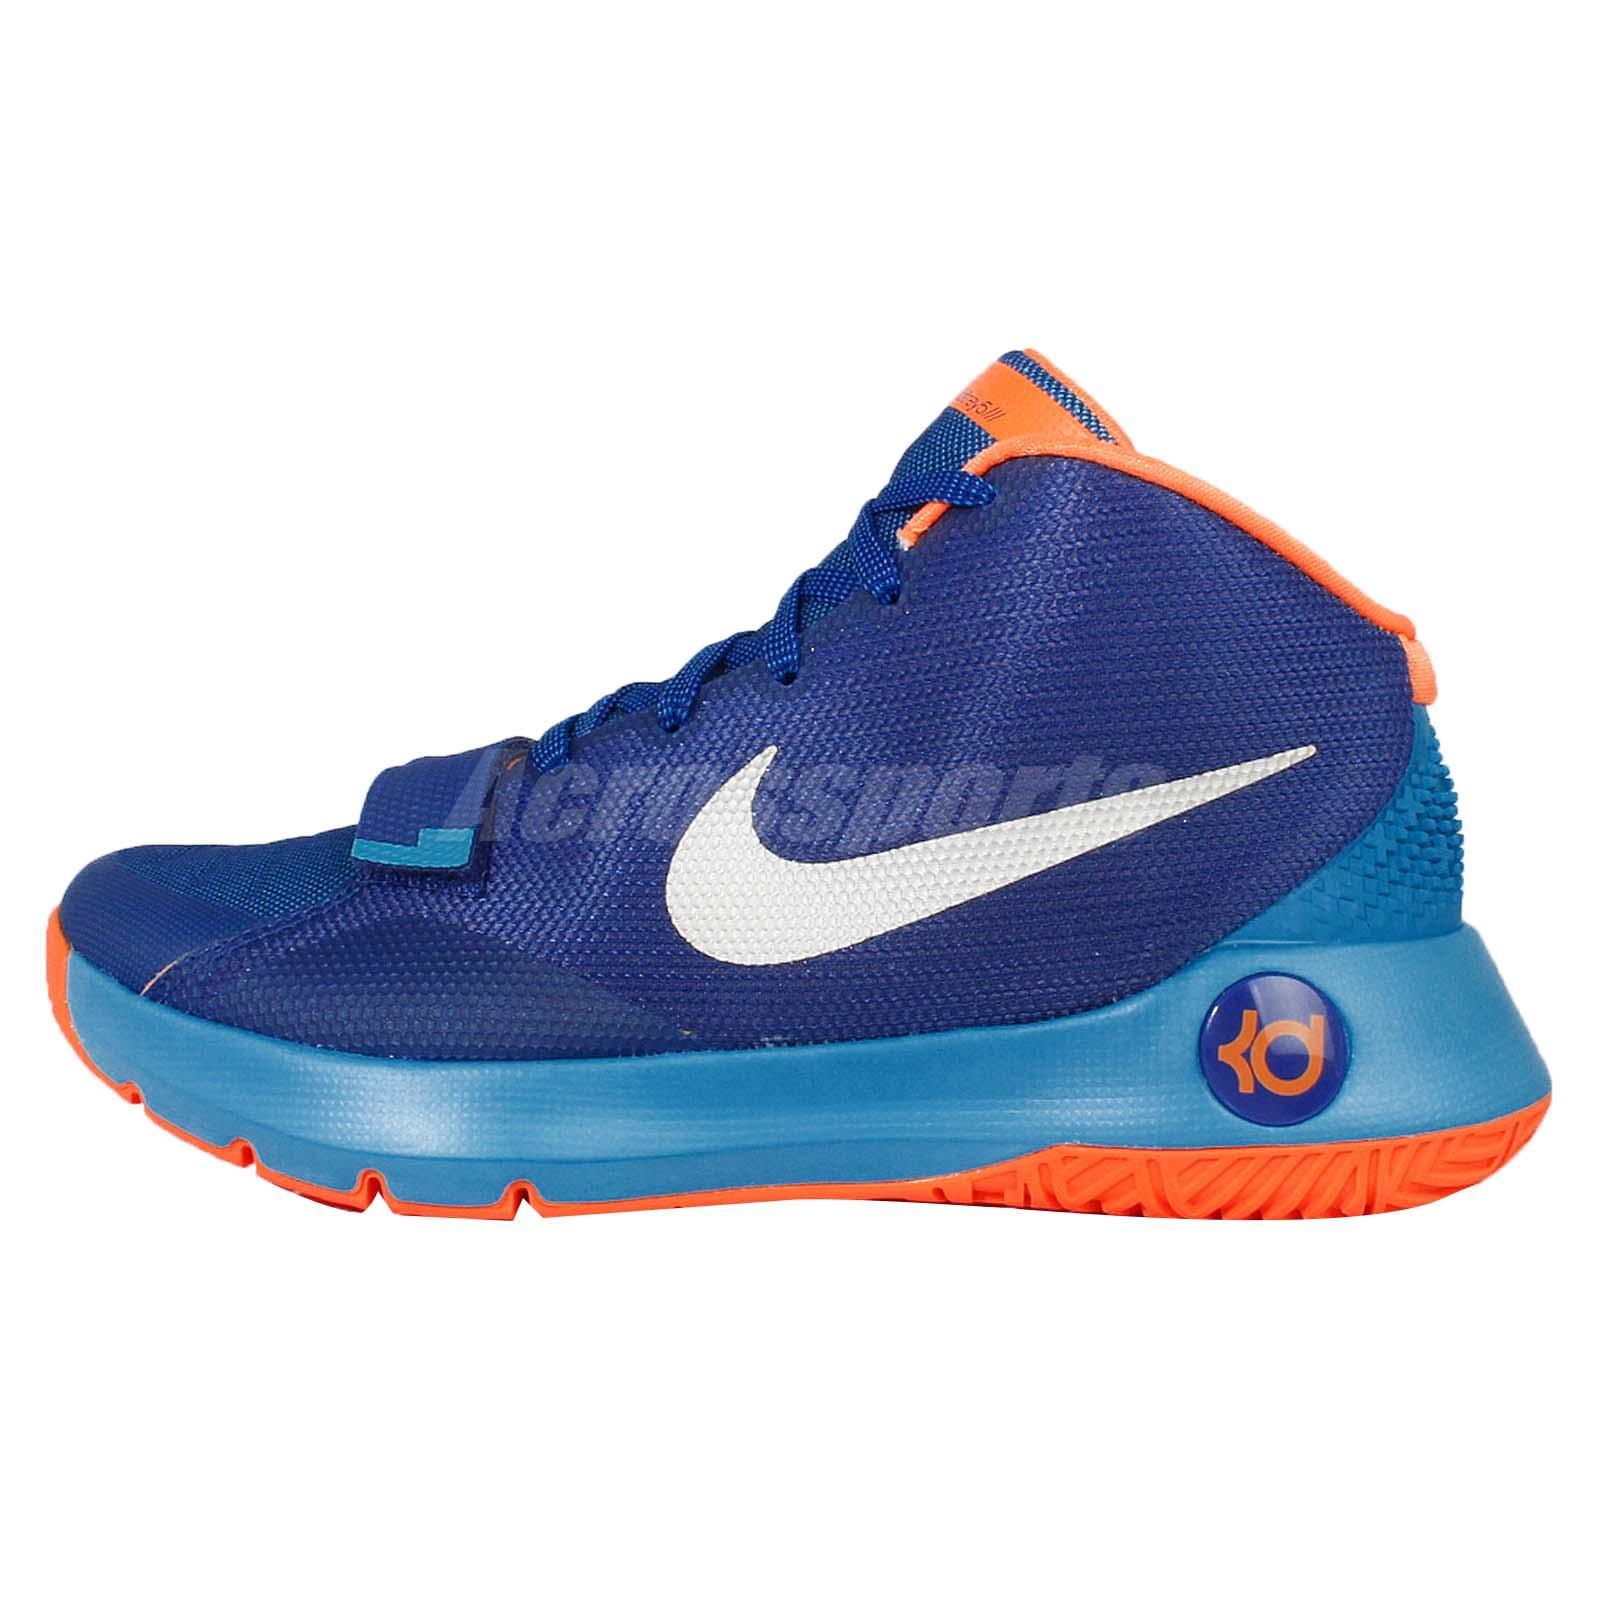 Kd Mens Basketball Shoes